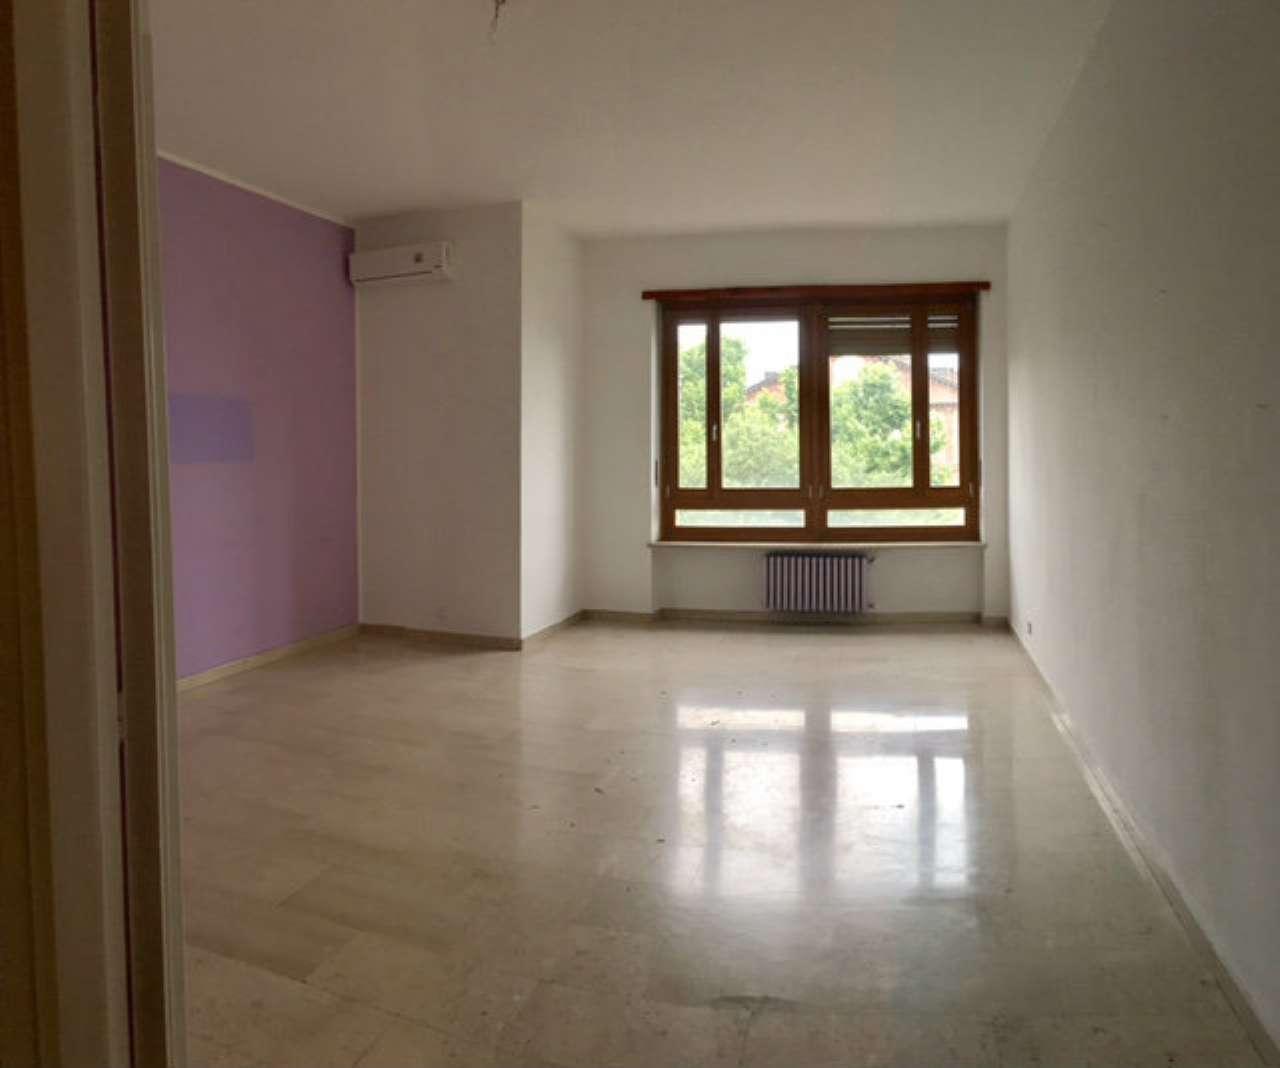 Foto 8 di Appartamento via Arnaldo da Brescia, Torino (zona Lingotto)